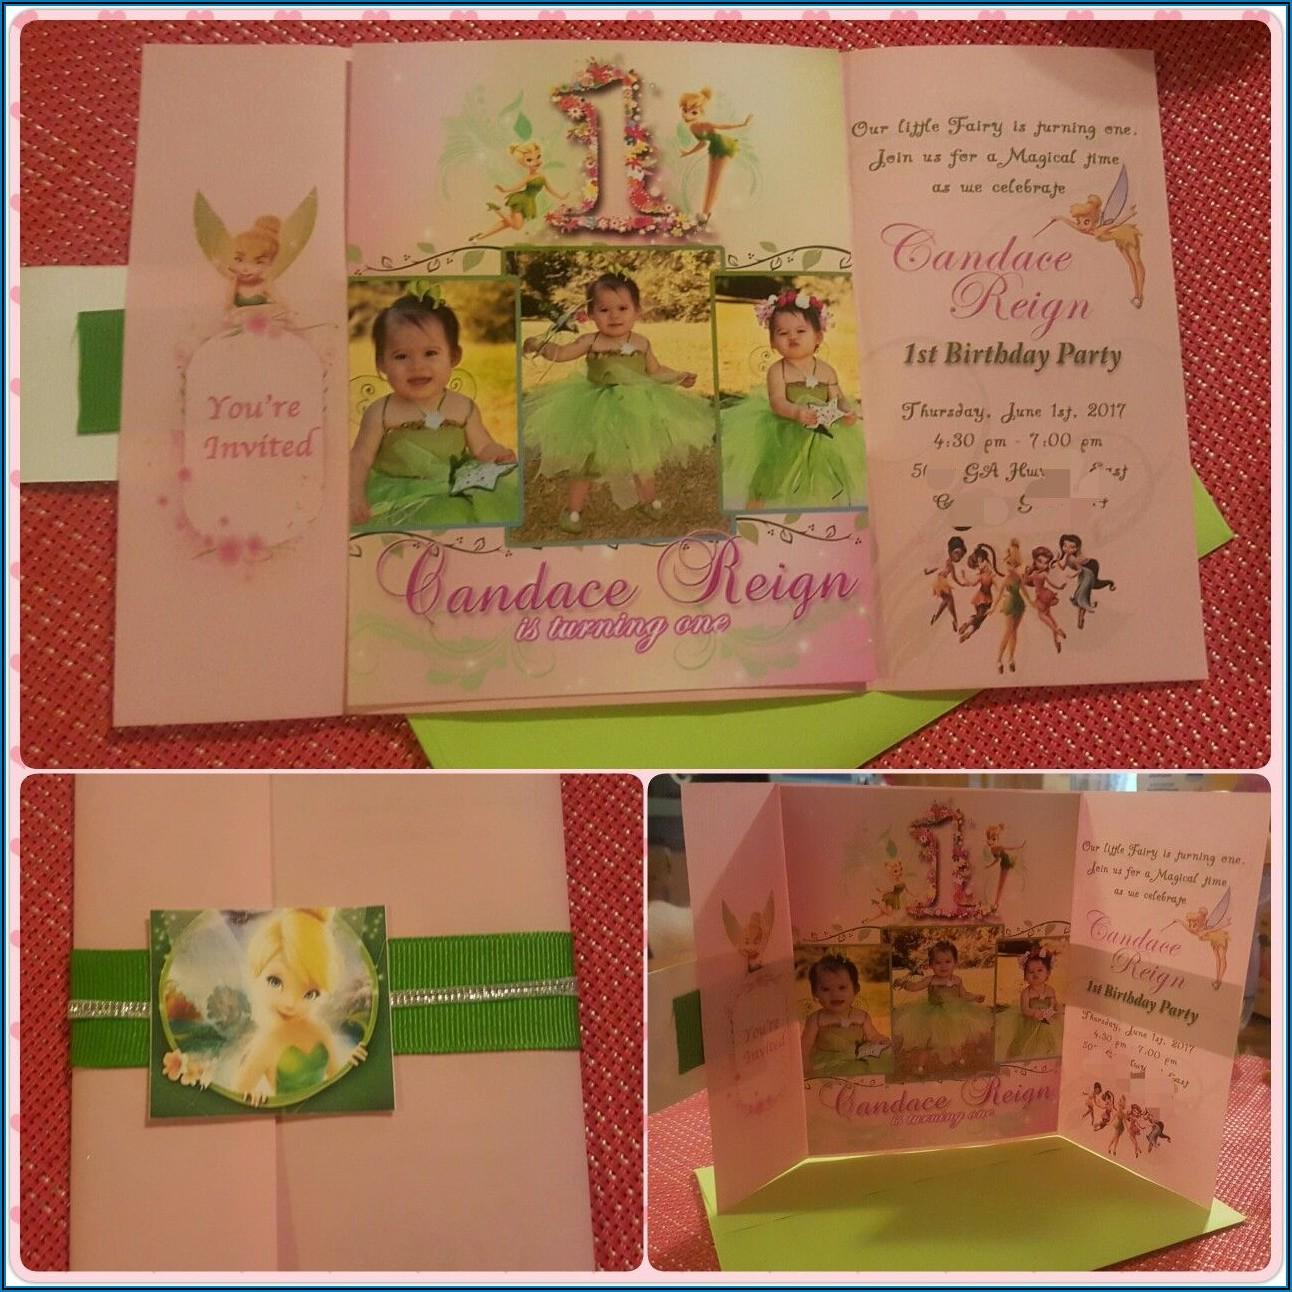 1st Birthday Invitation Card Design For Baby Girl